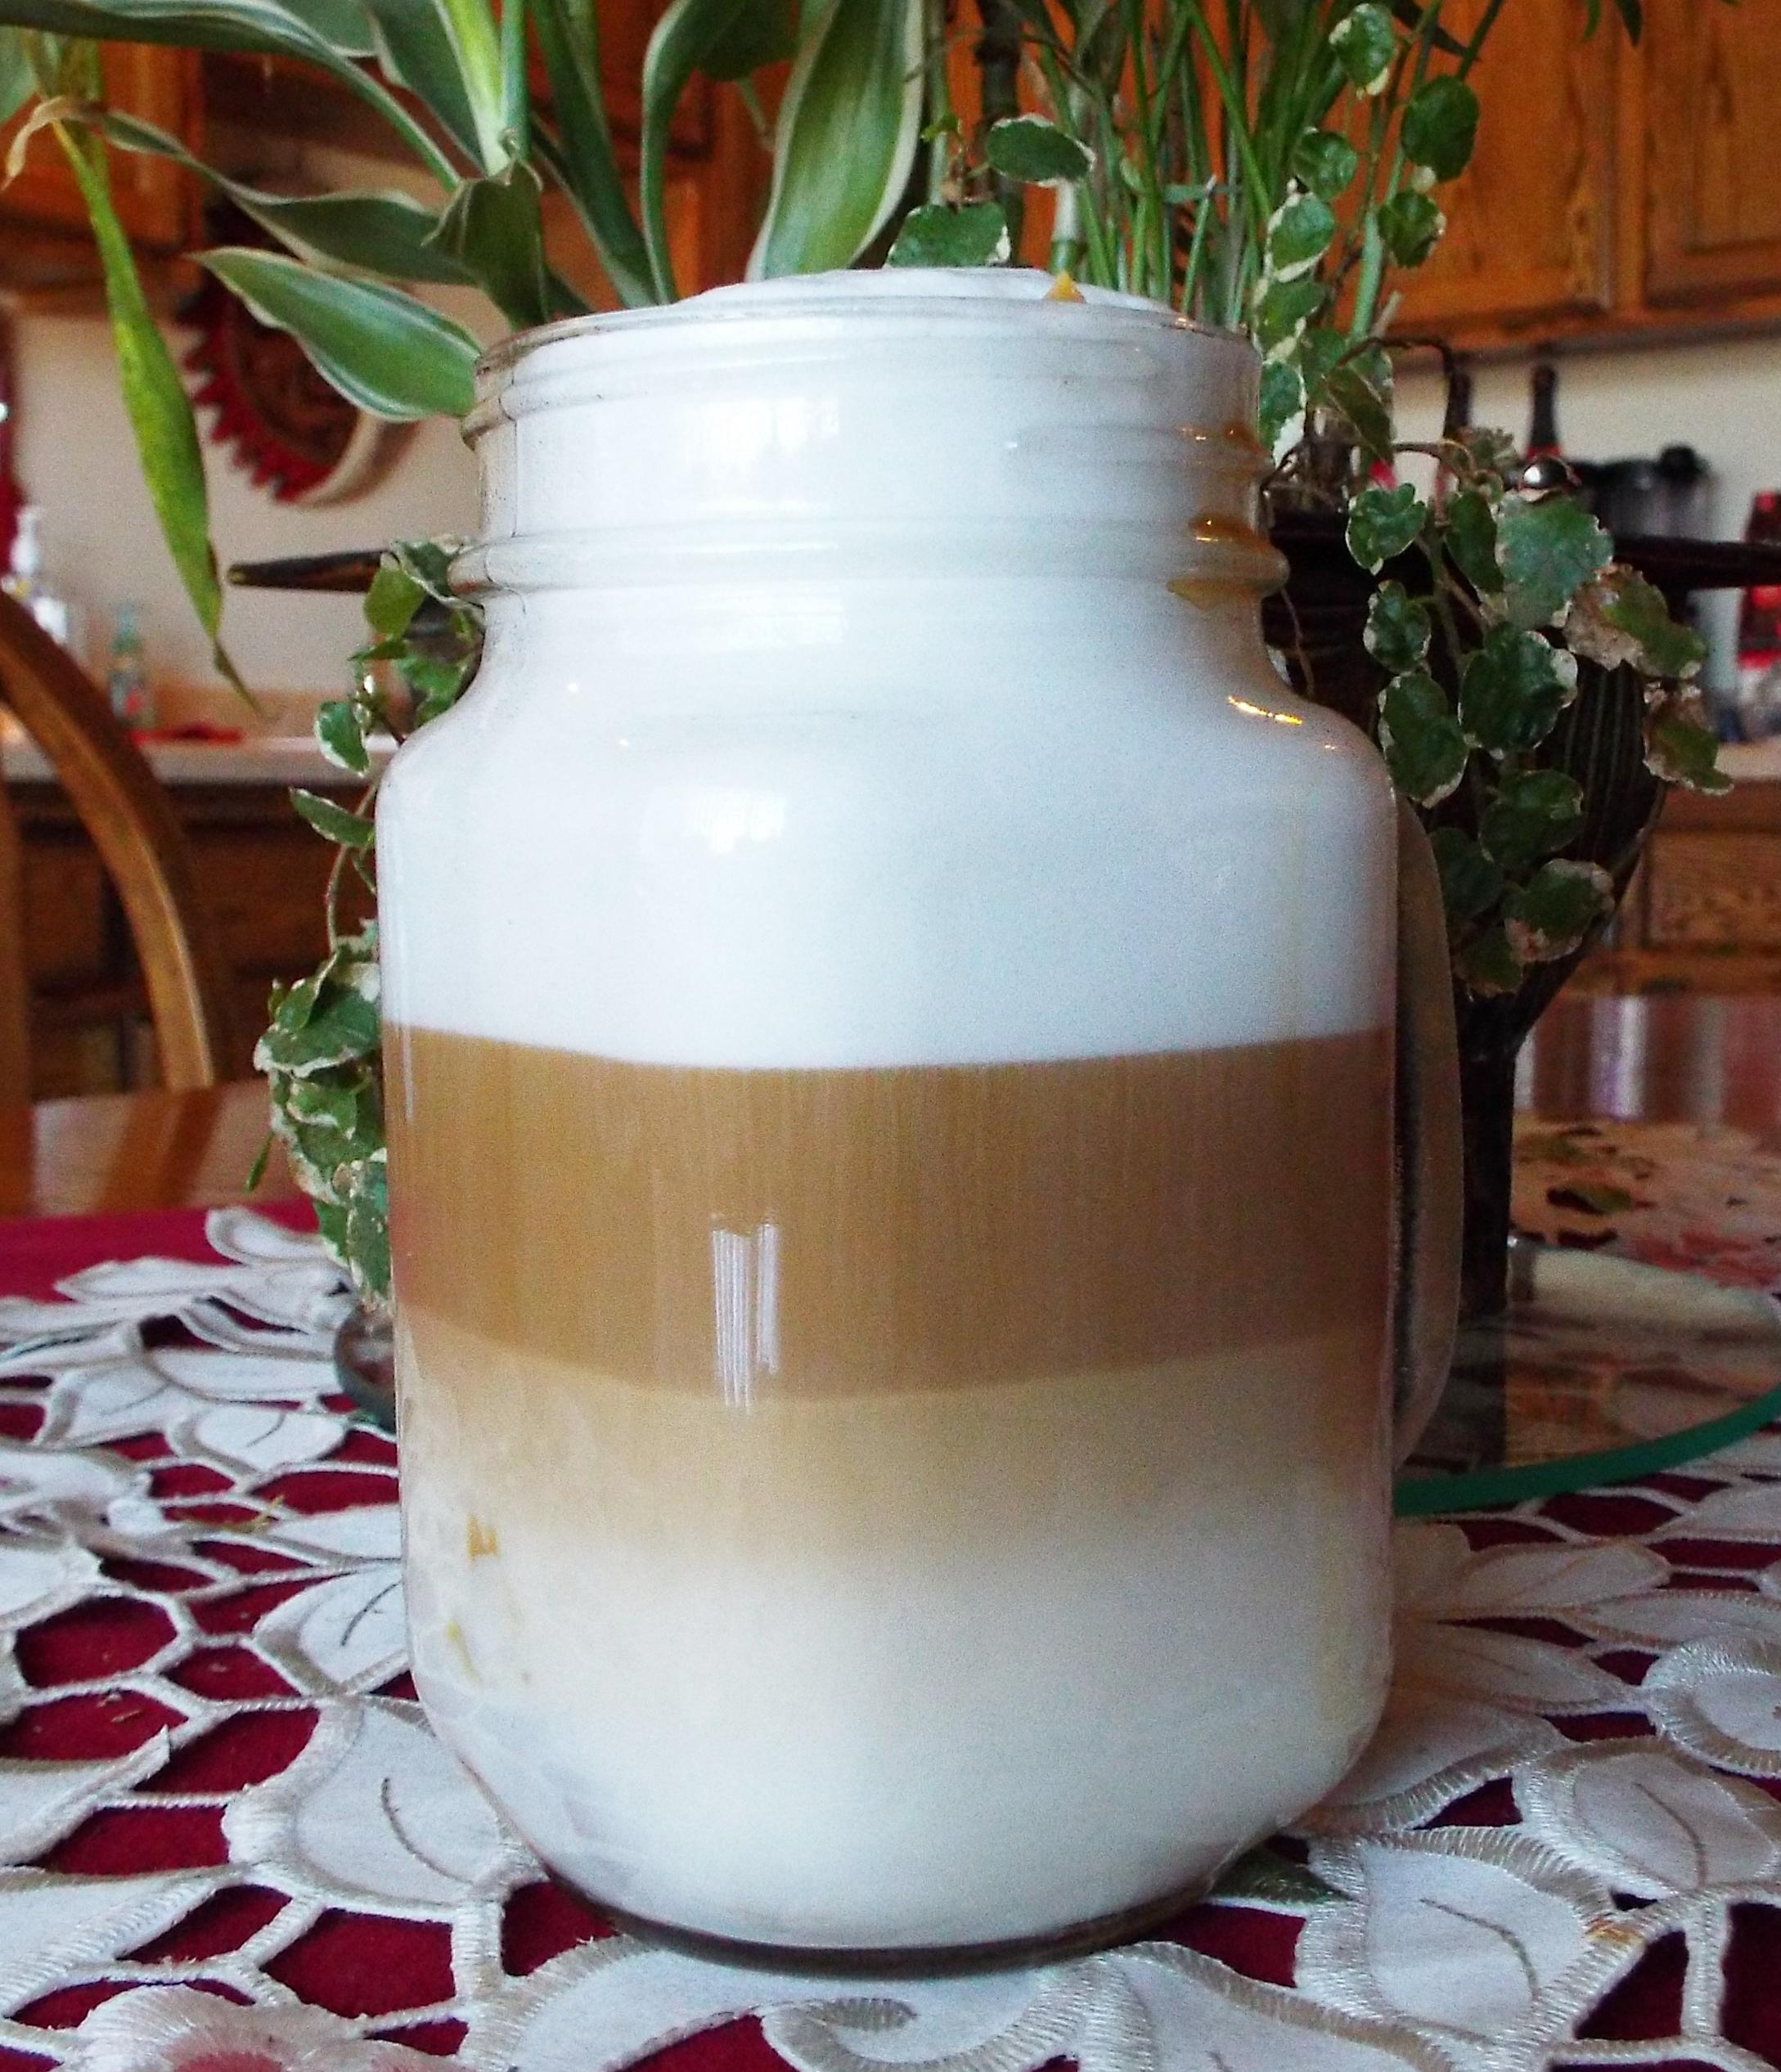 White Chocolate Peanut Butter Latte